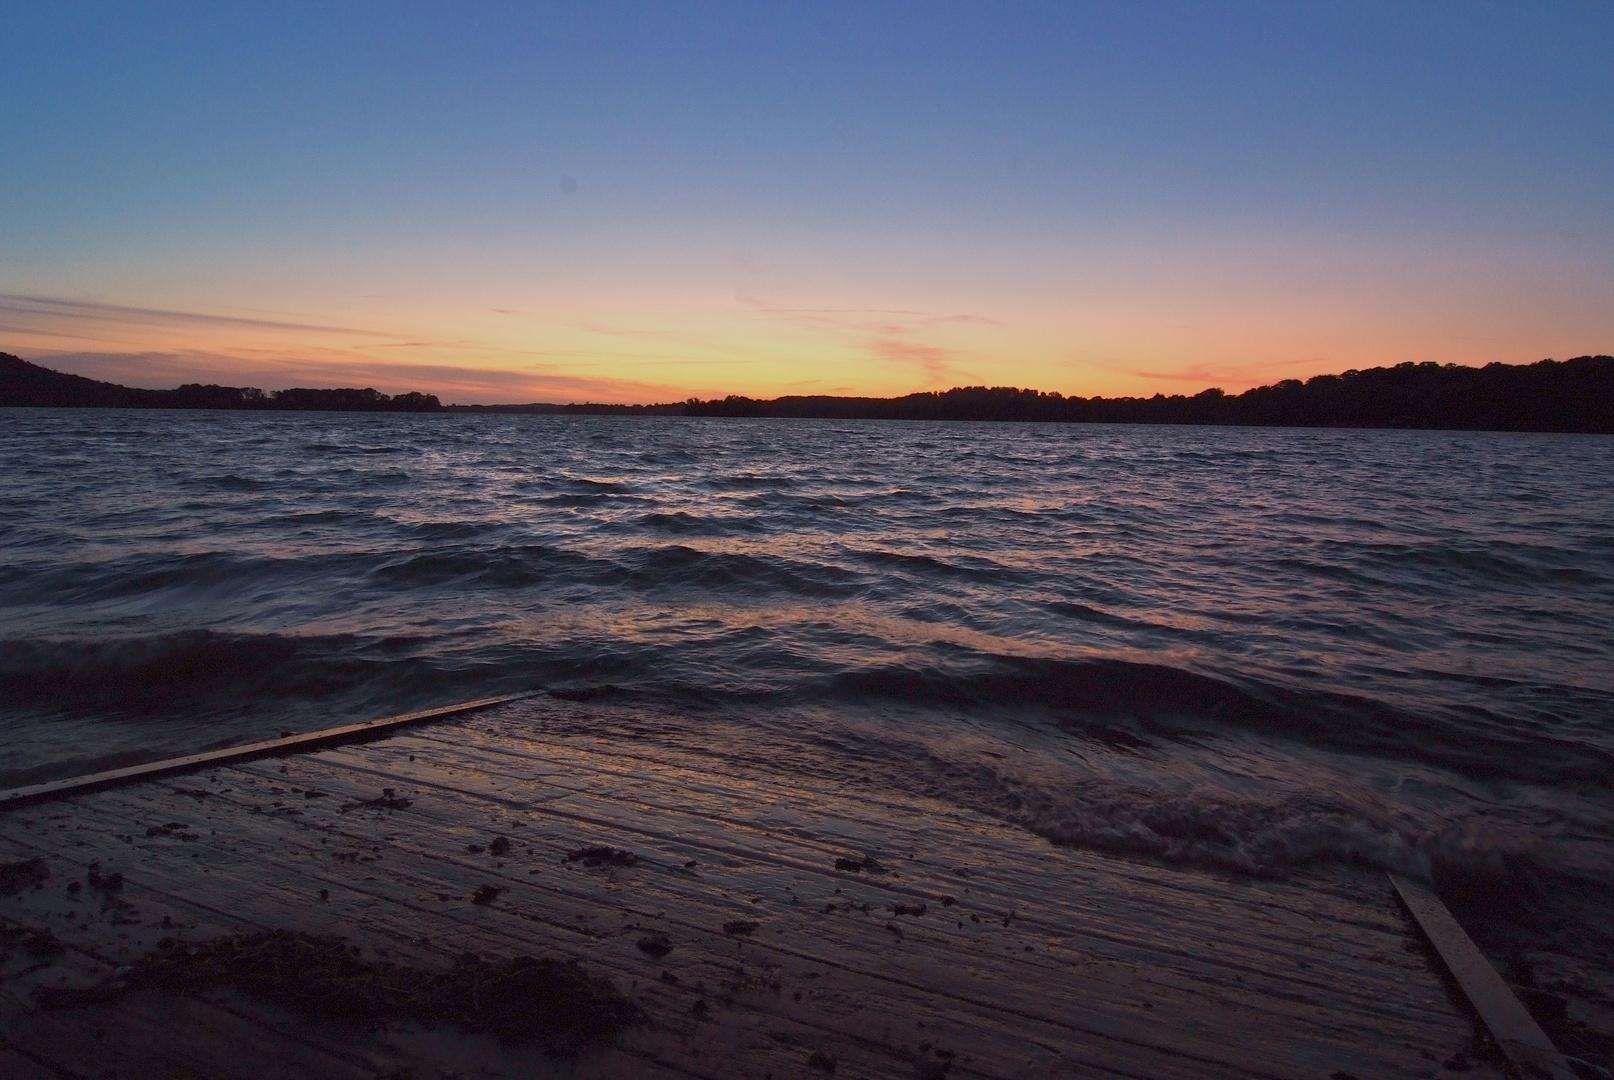 Sonnenunterang am See